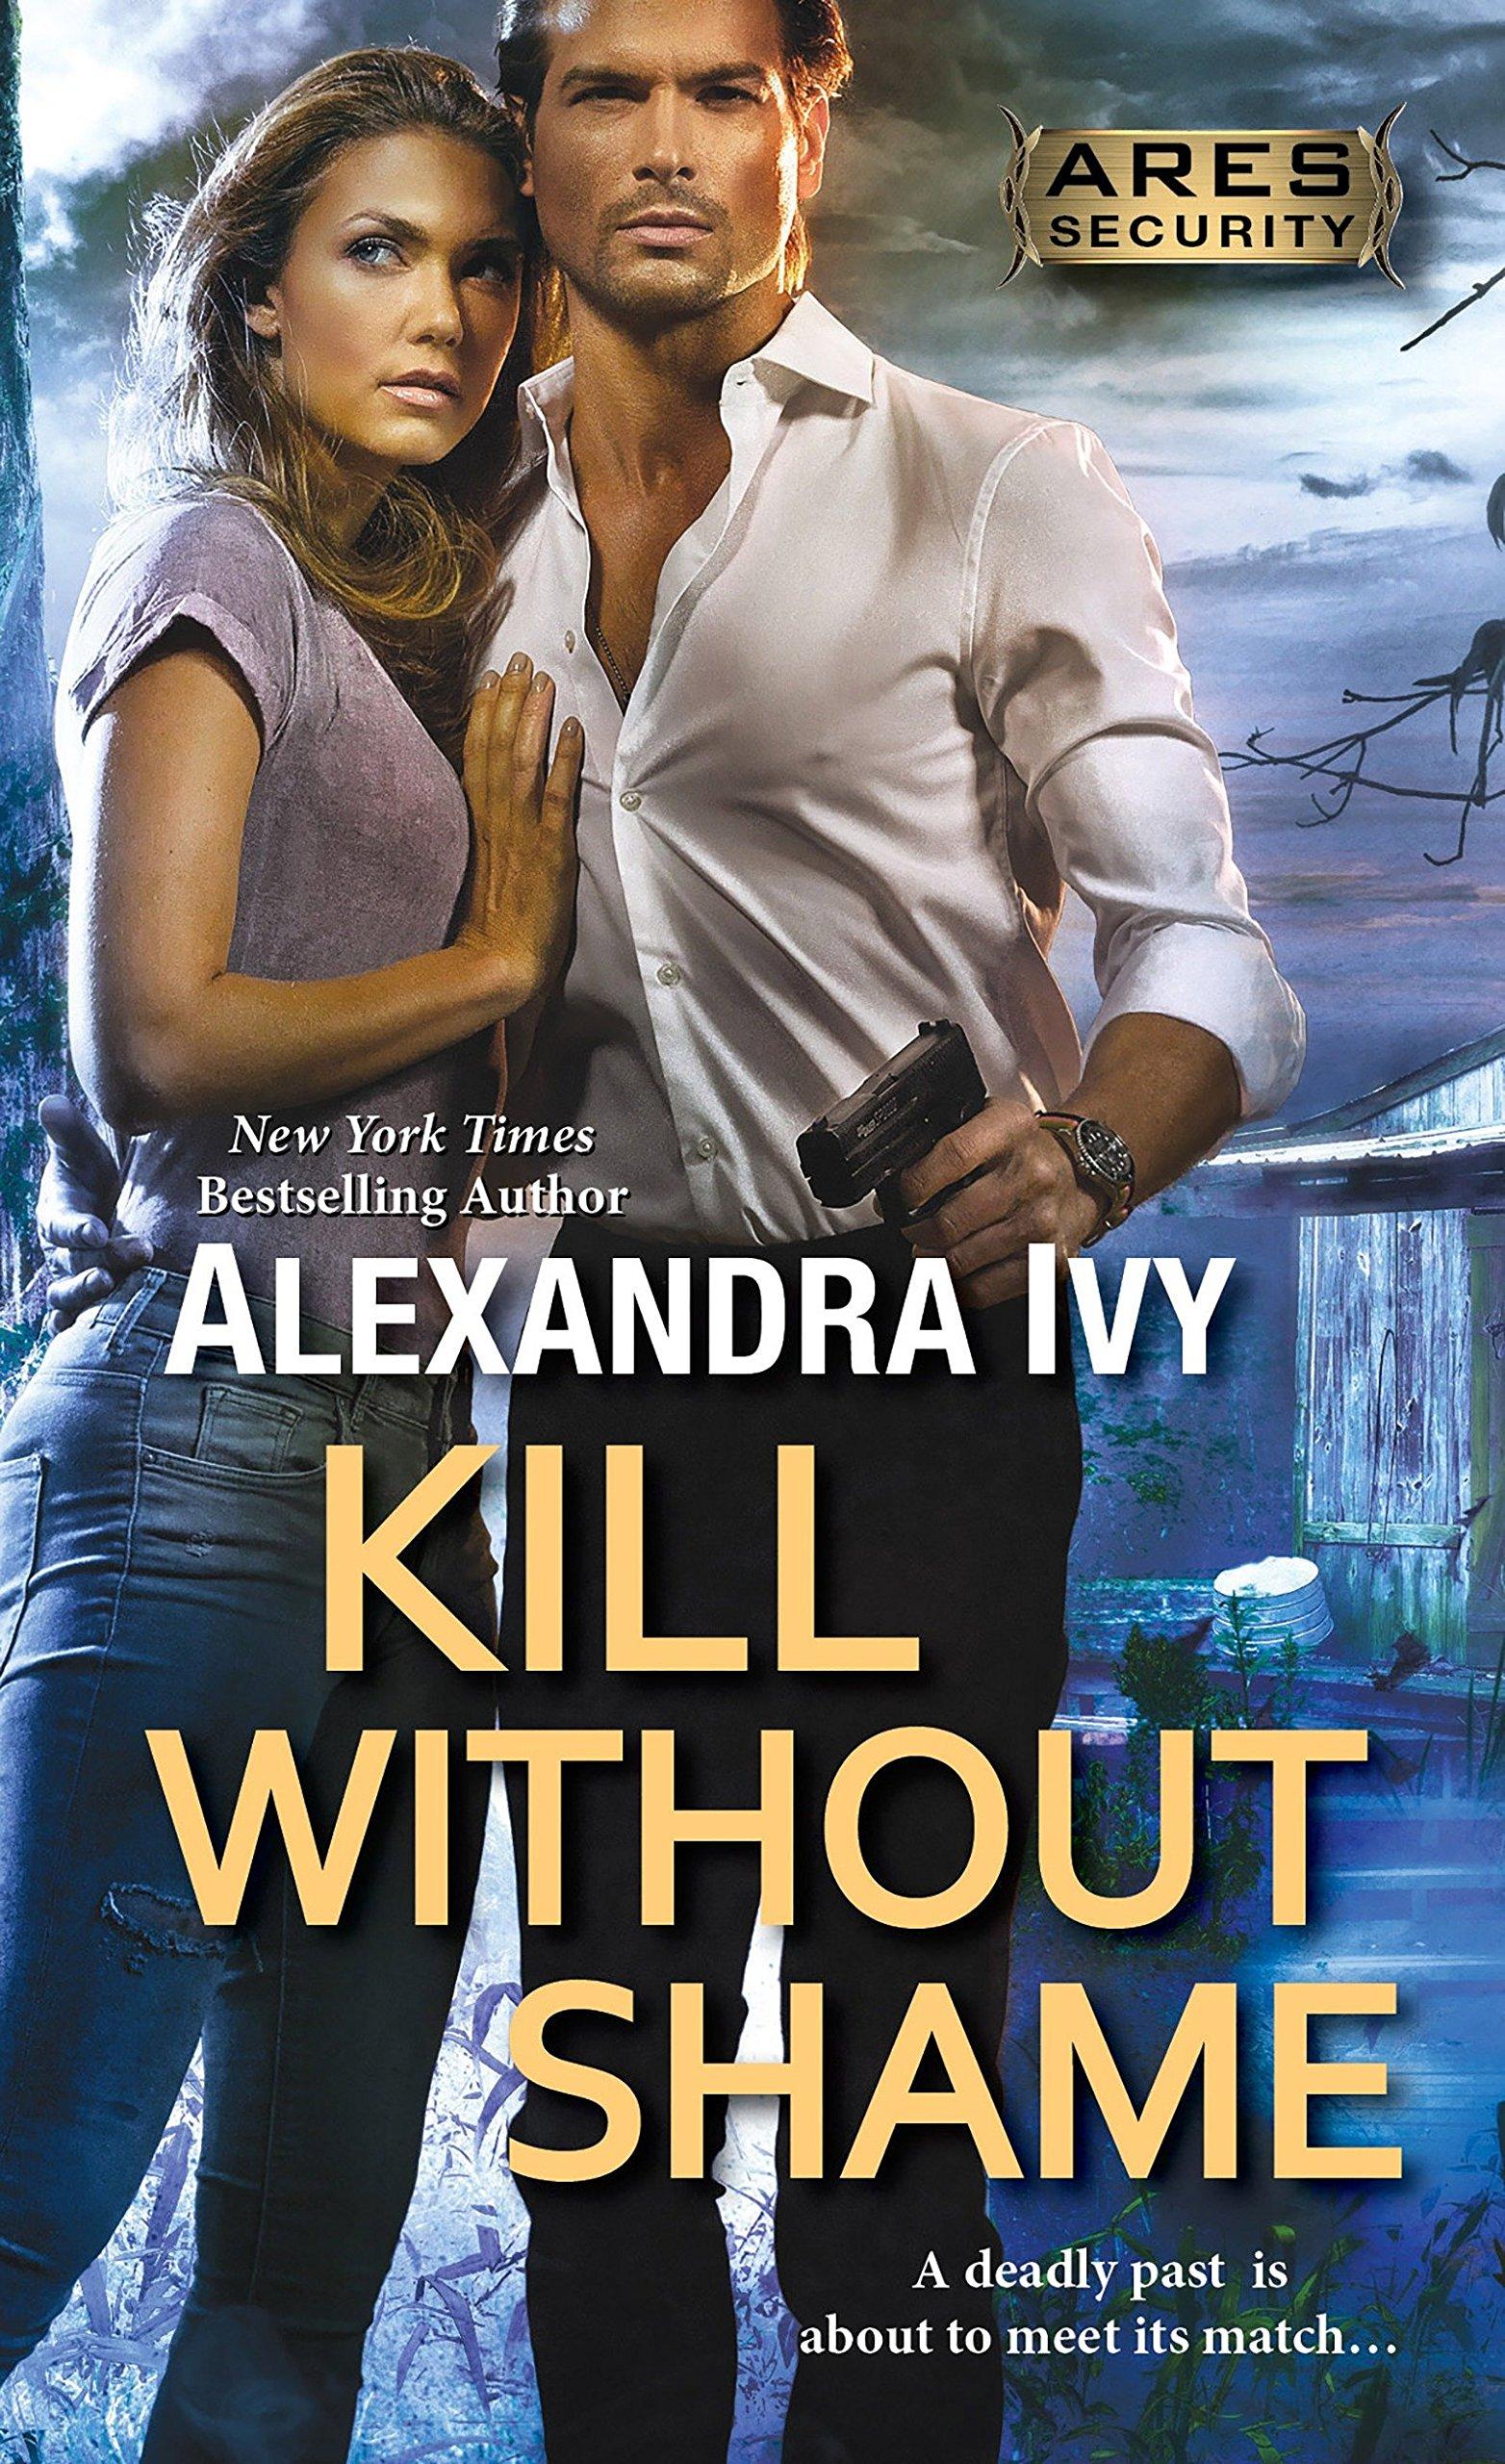 Alexandra Ivy: biography and creativity 25